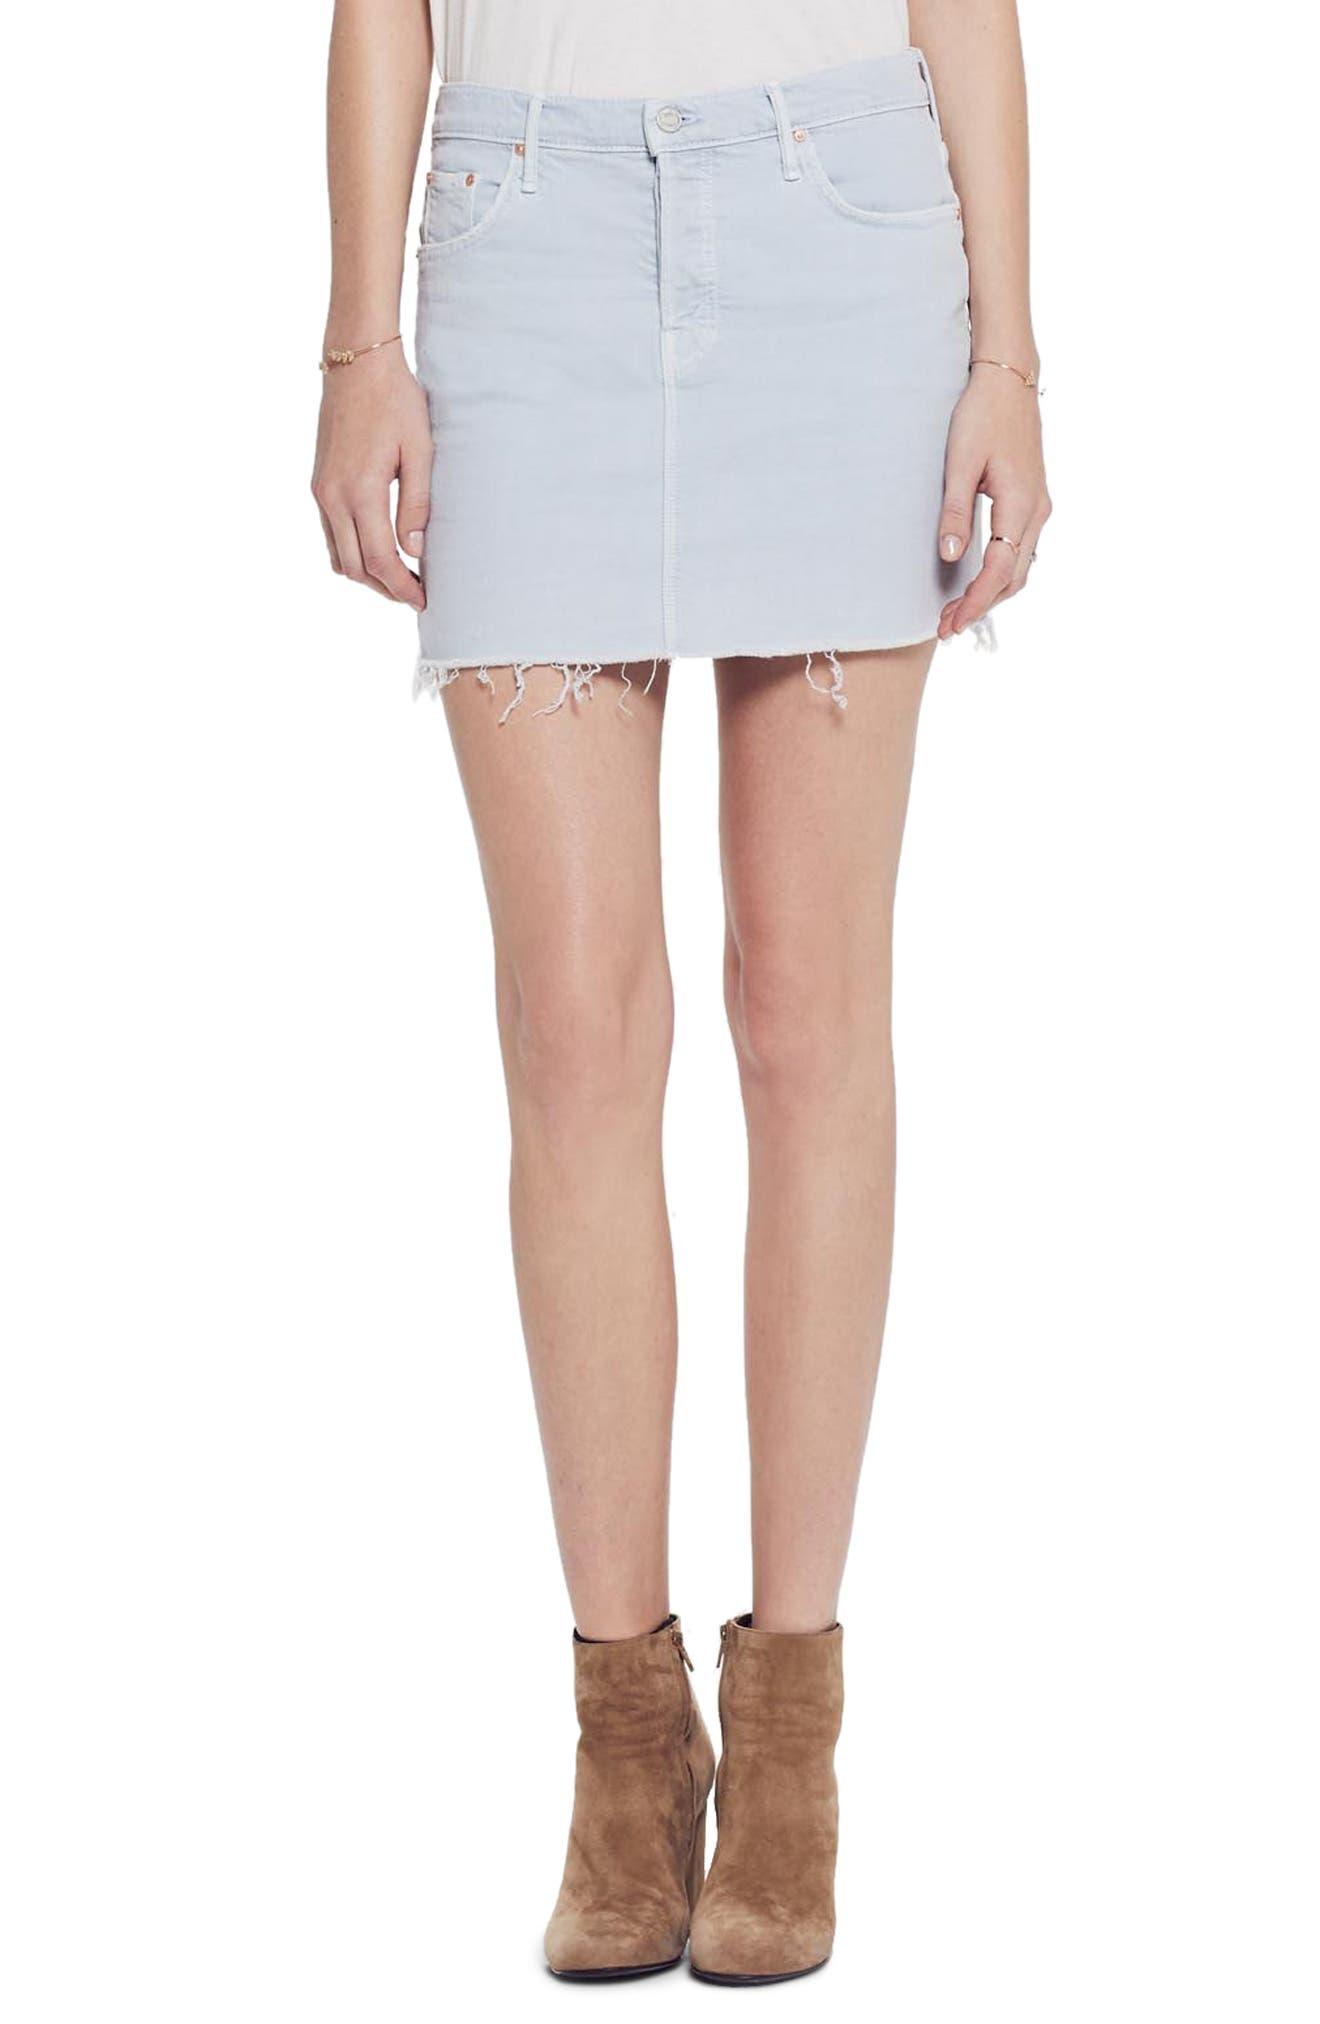 MOTHER, The Vagabond Cutoff Denim Miniskirt, Main thumbnail 1, color, 450